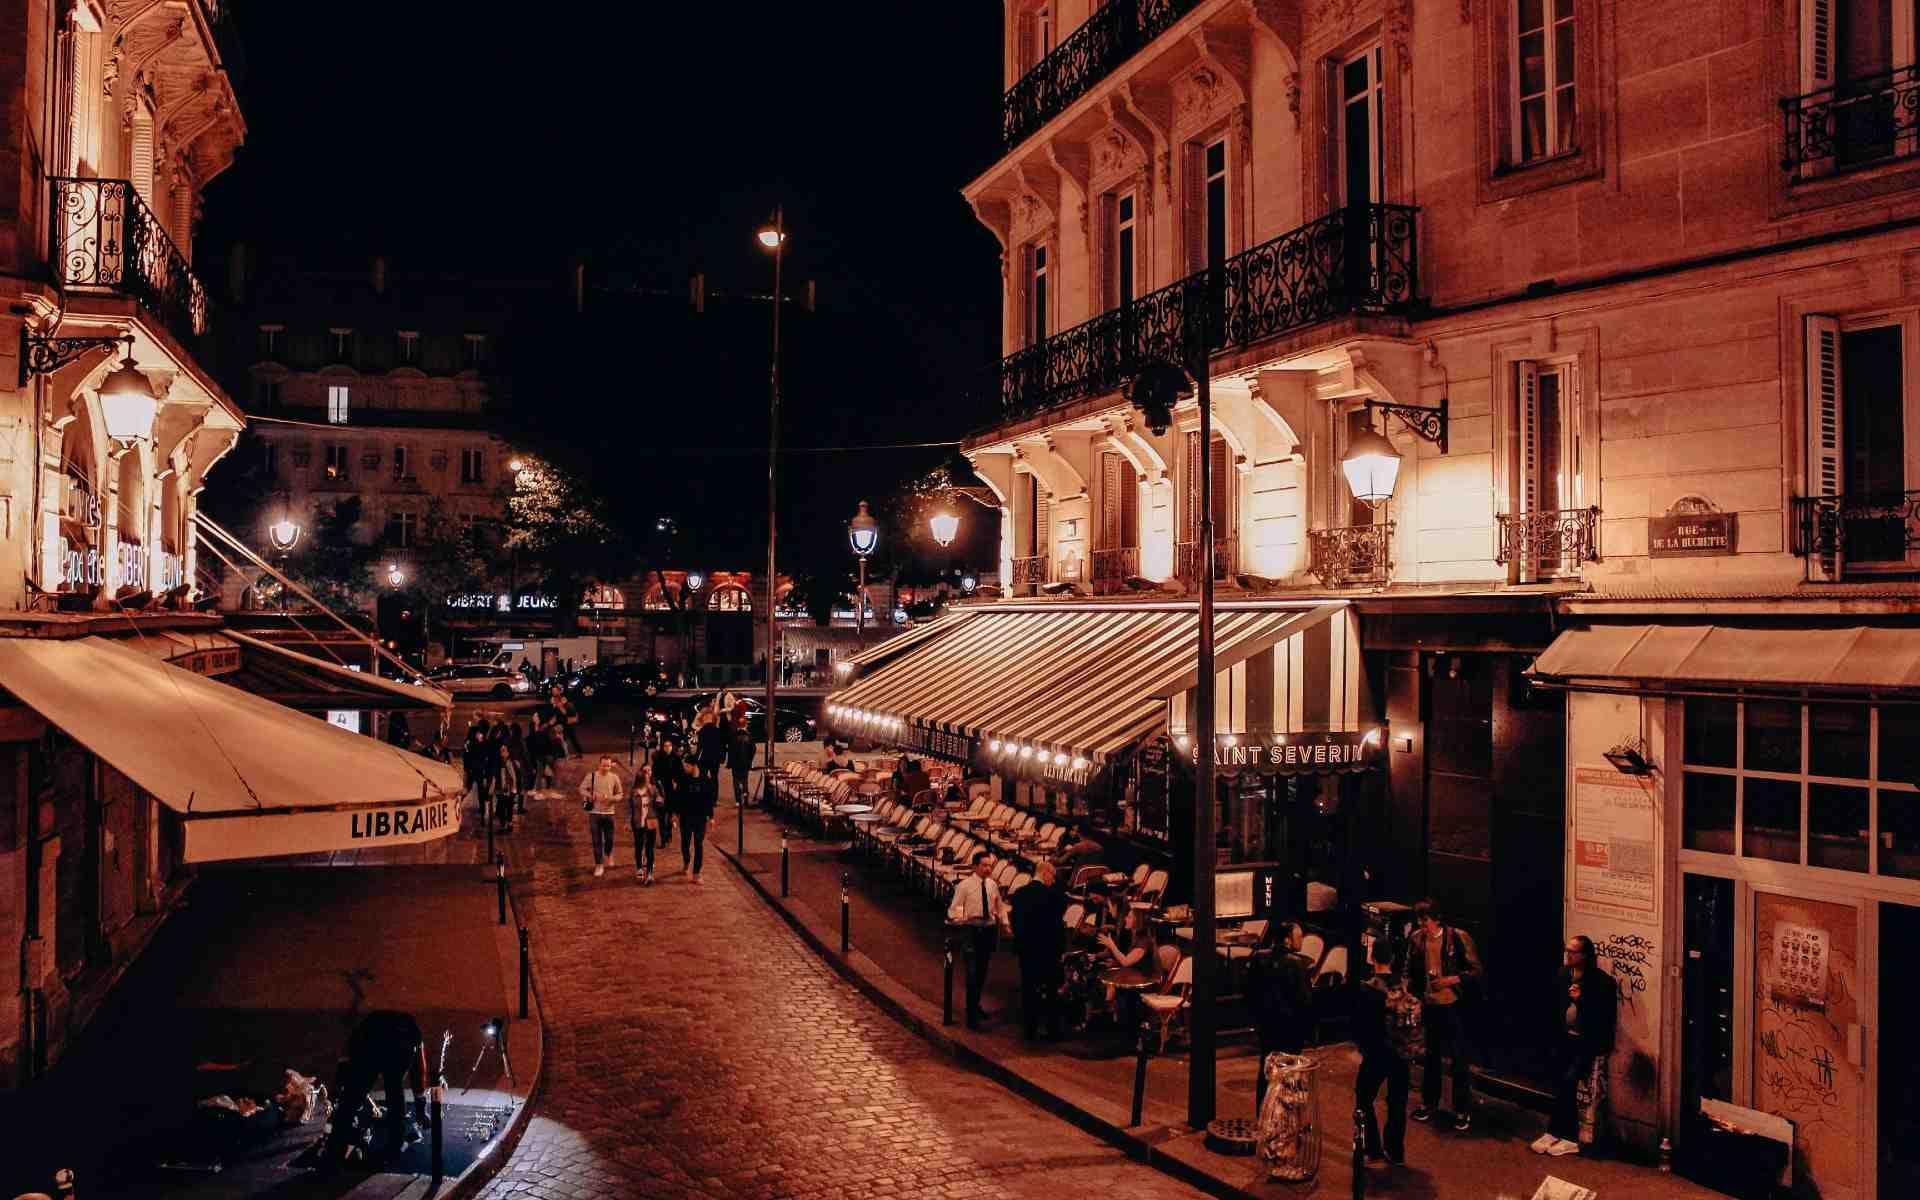 Latin Quarter highlights: True Feathers, Paris [TEST MODE] image